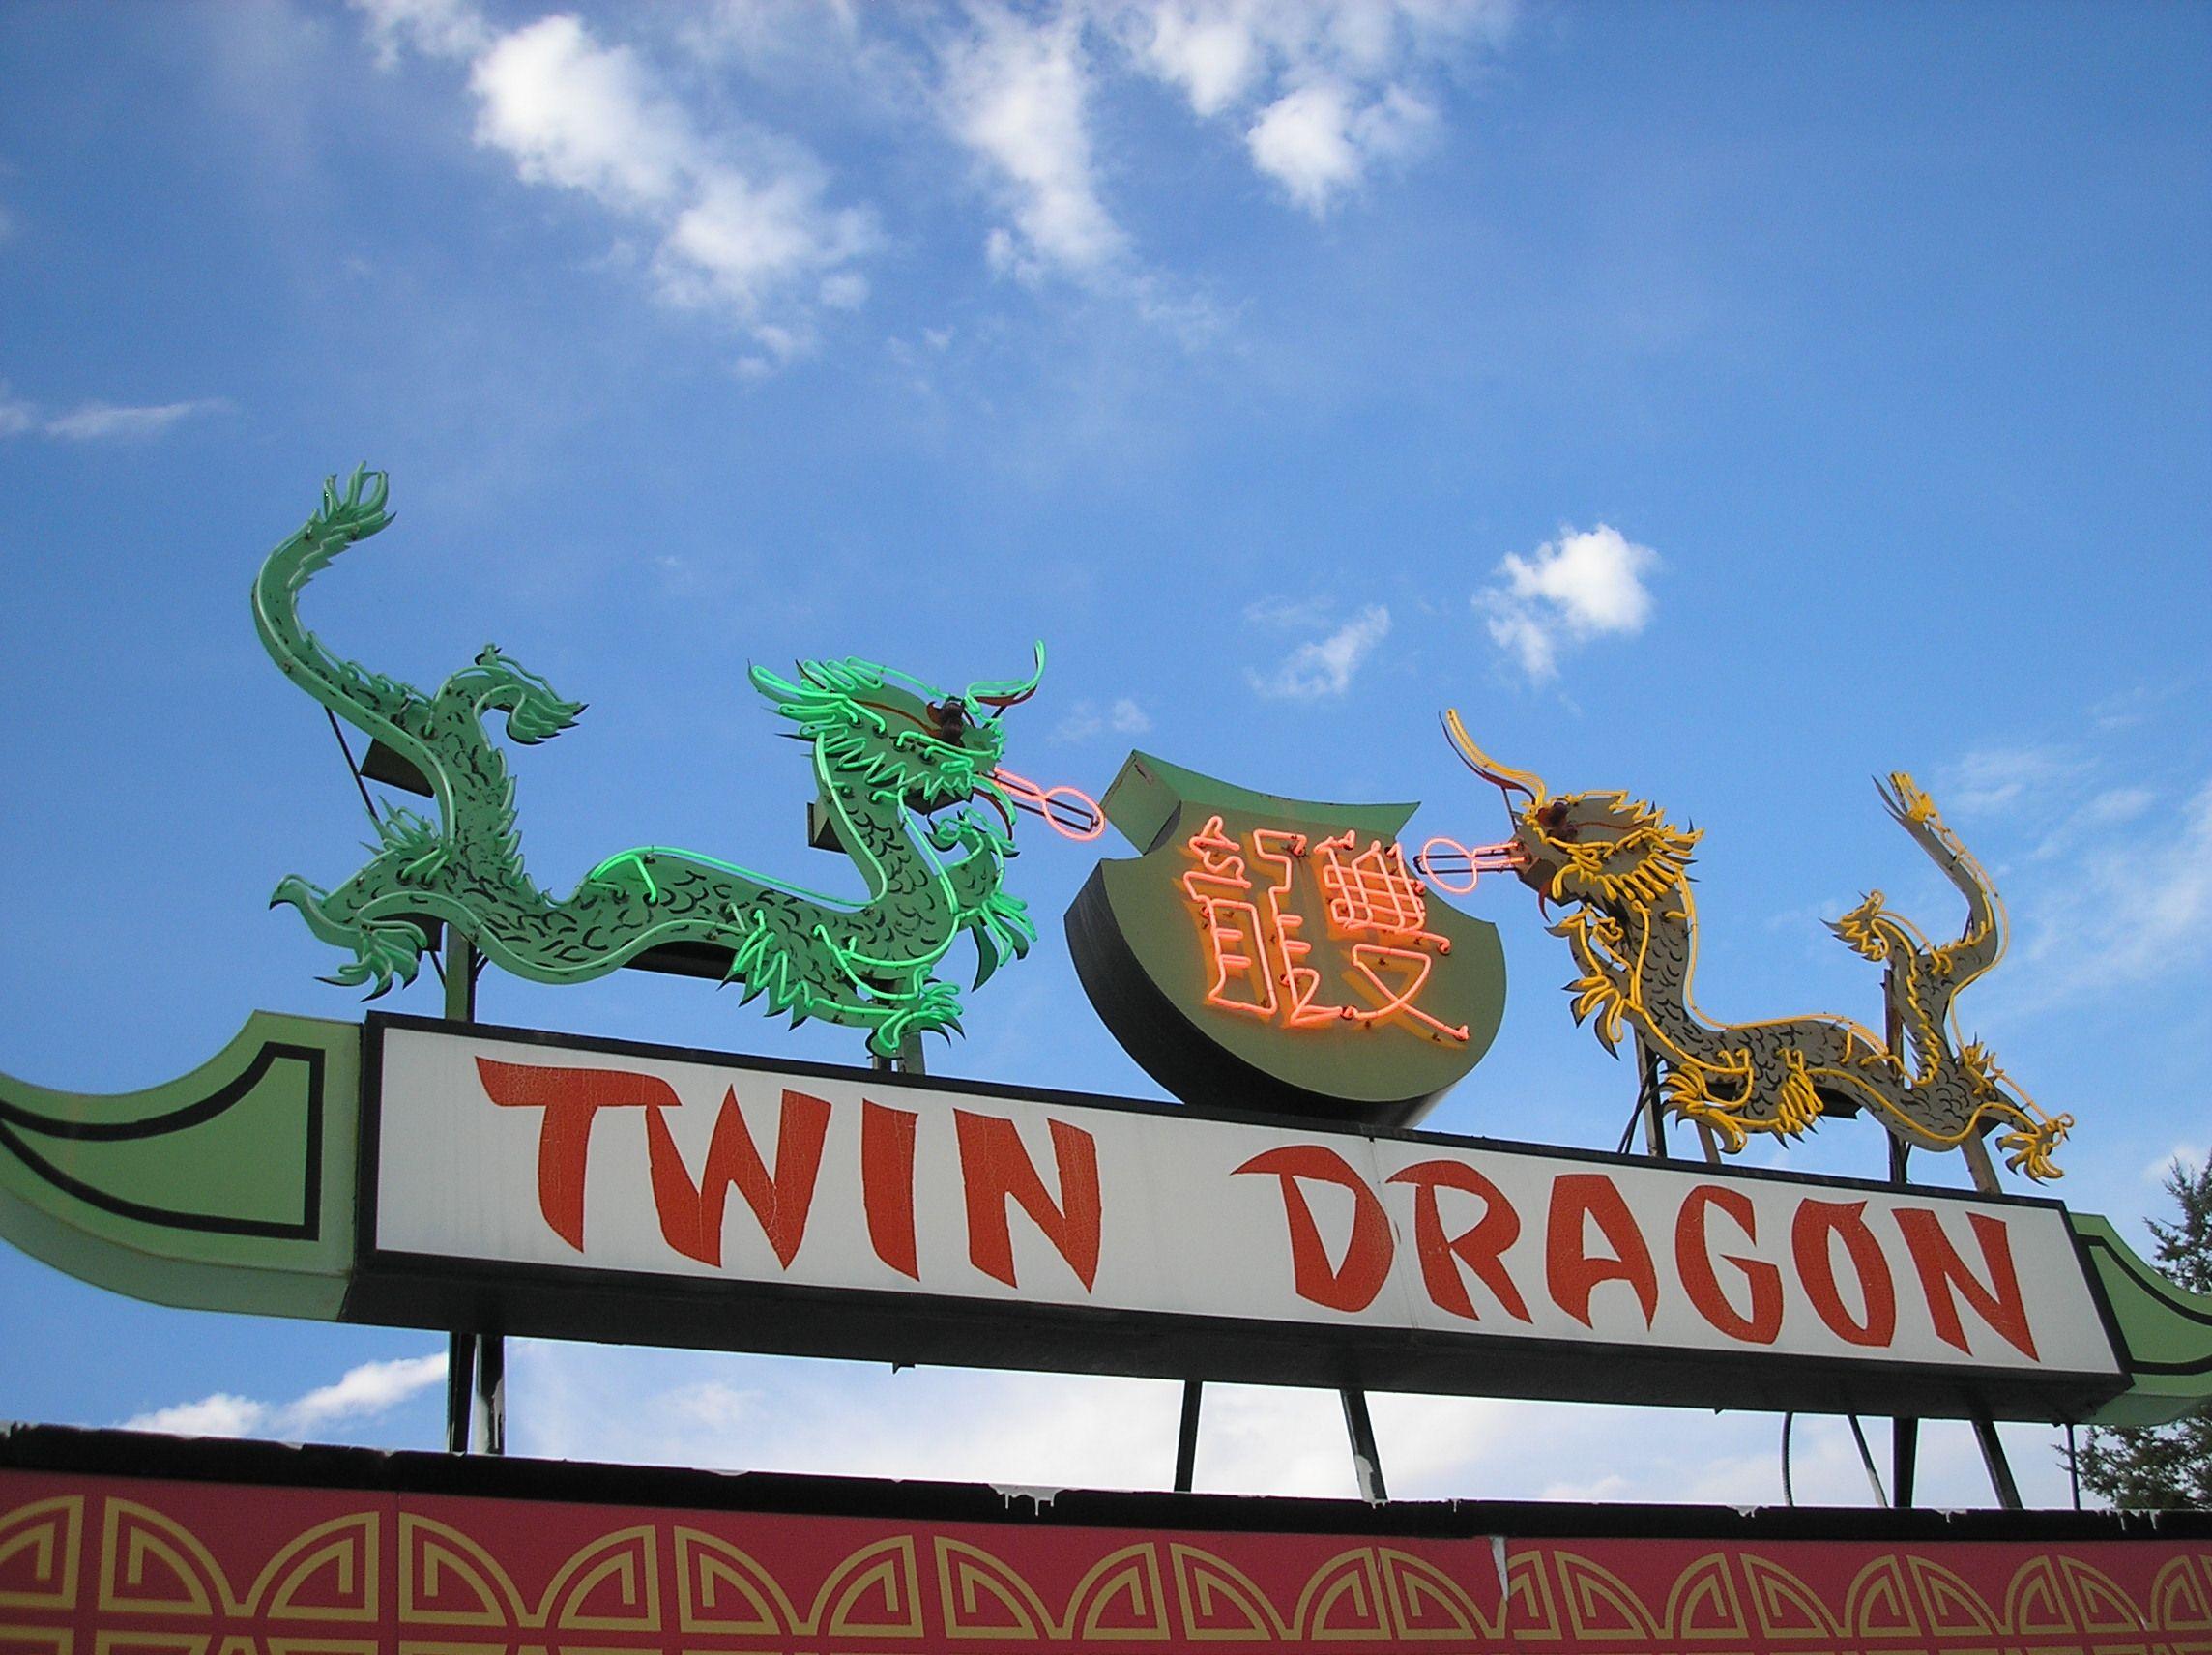 louie u0027s twin dragon restaurant boise idaho photo by steve golse